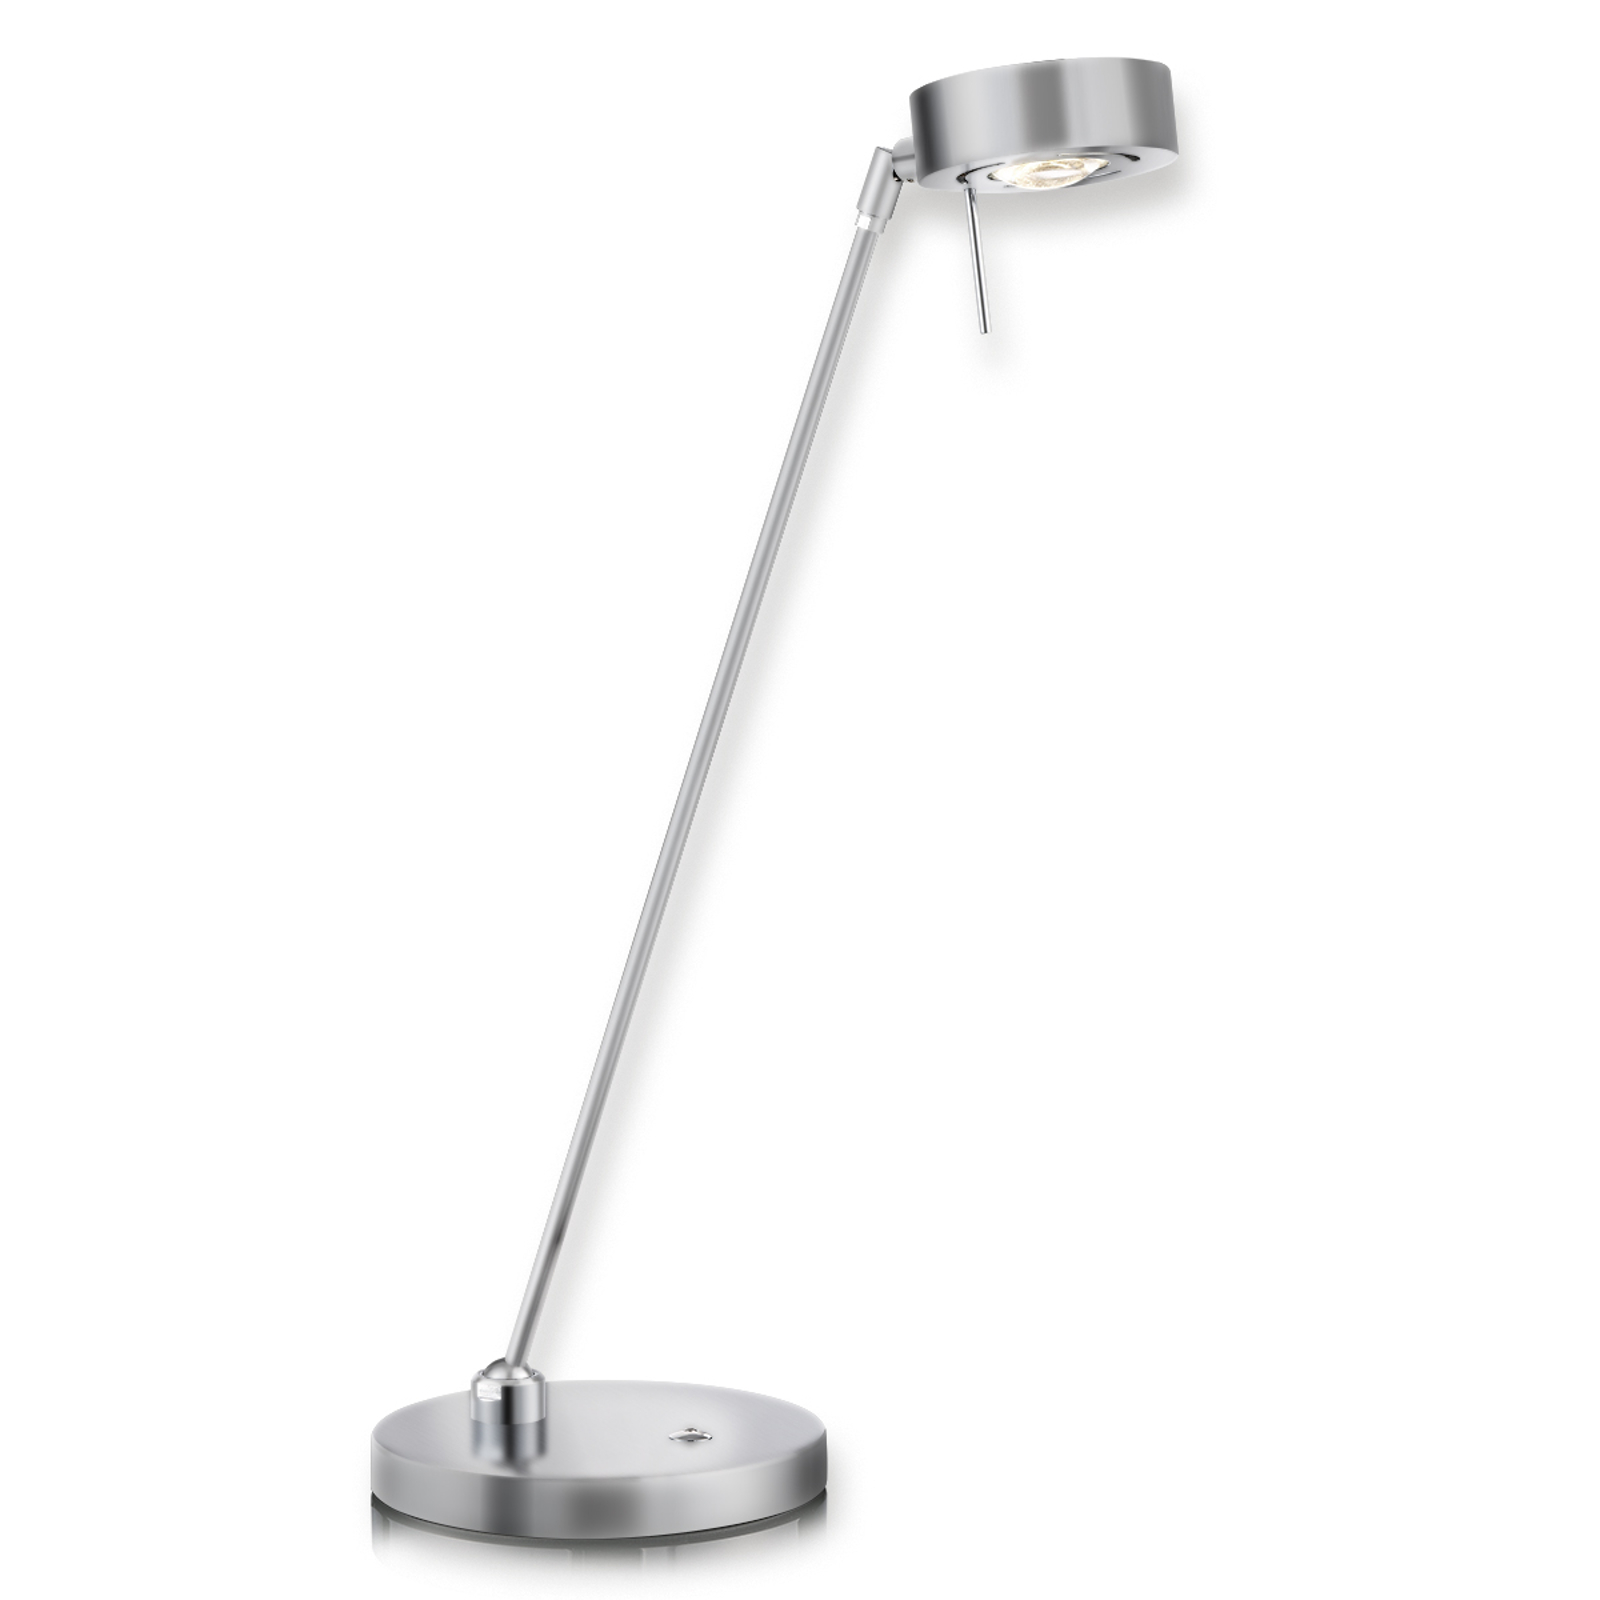 LED-tafellamp Elegance met 2 scharnieren, nikkel